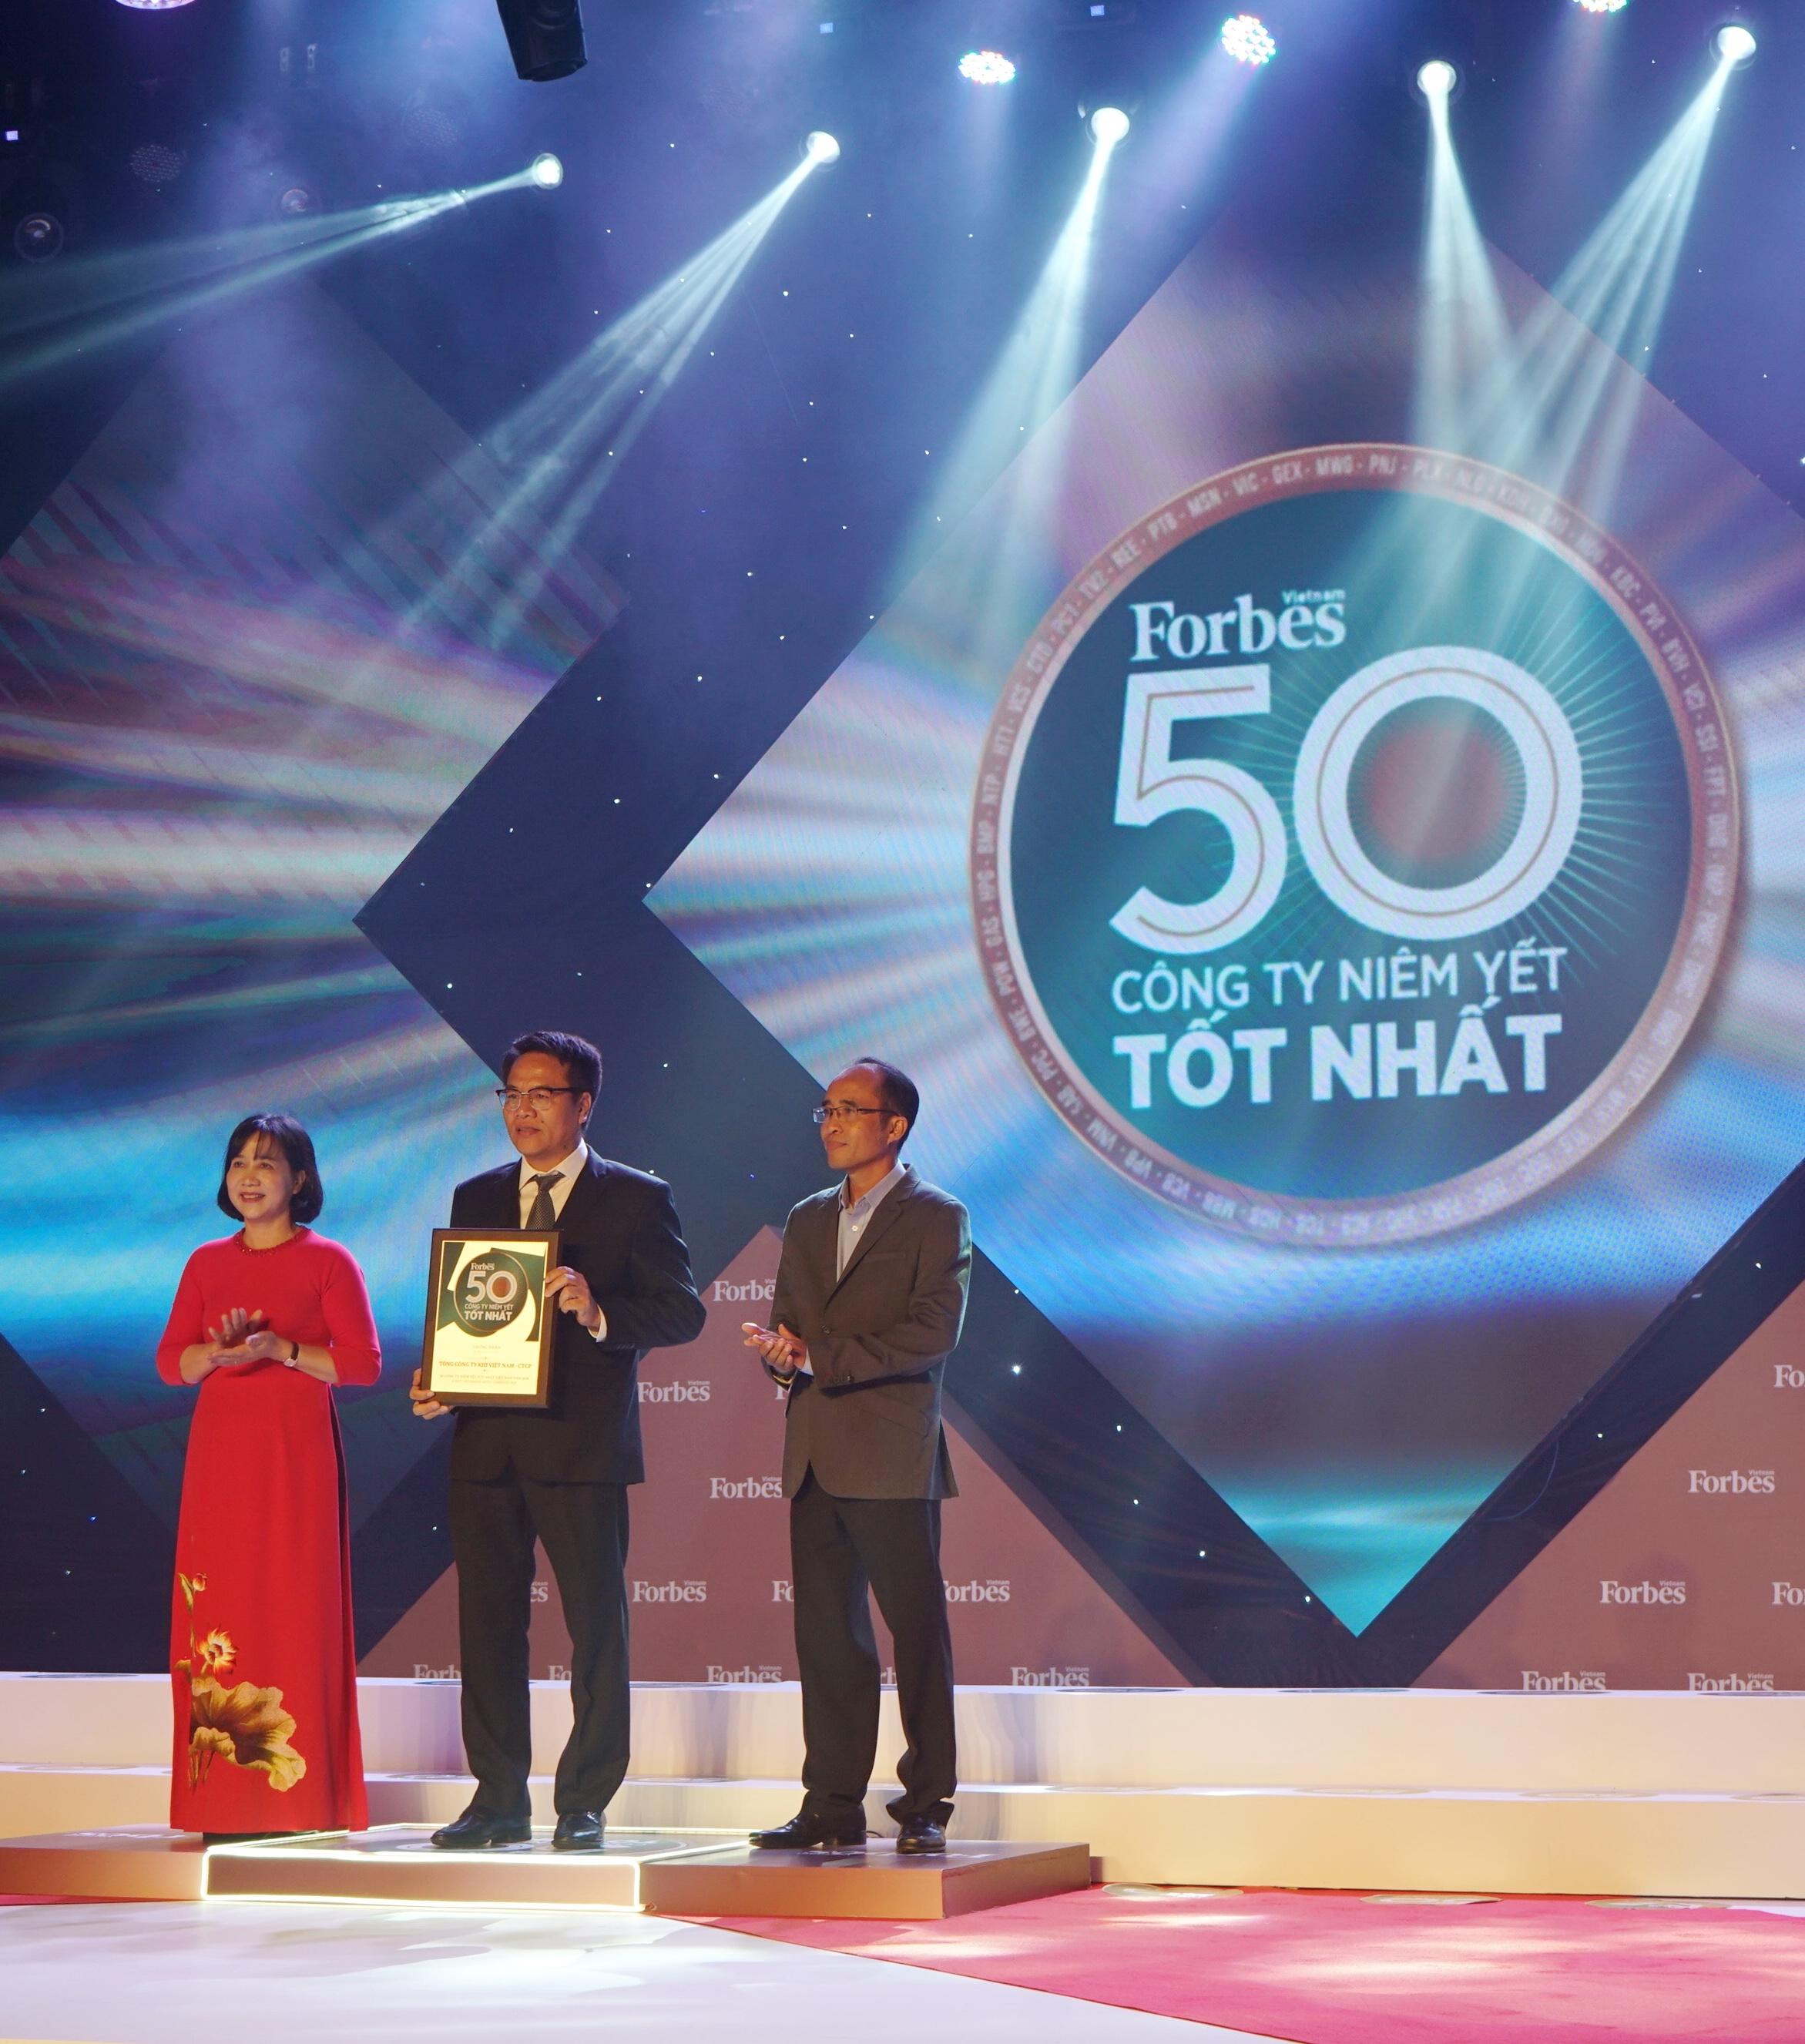 pv gas lan thu 8 lien tiep nhan vinh danh cua forbes top 50 cong ty niem yet tot nhat viet nam nam 2019